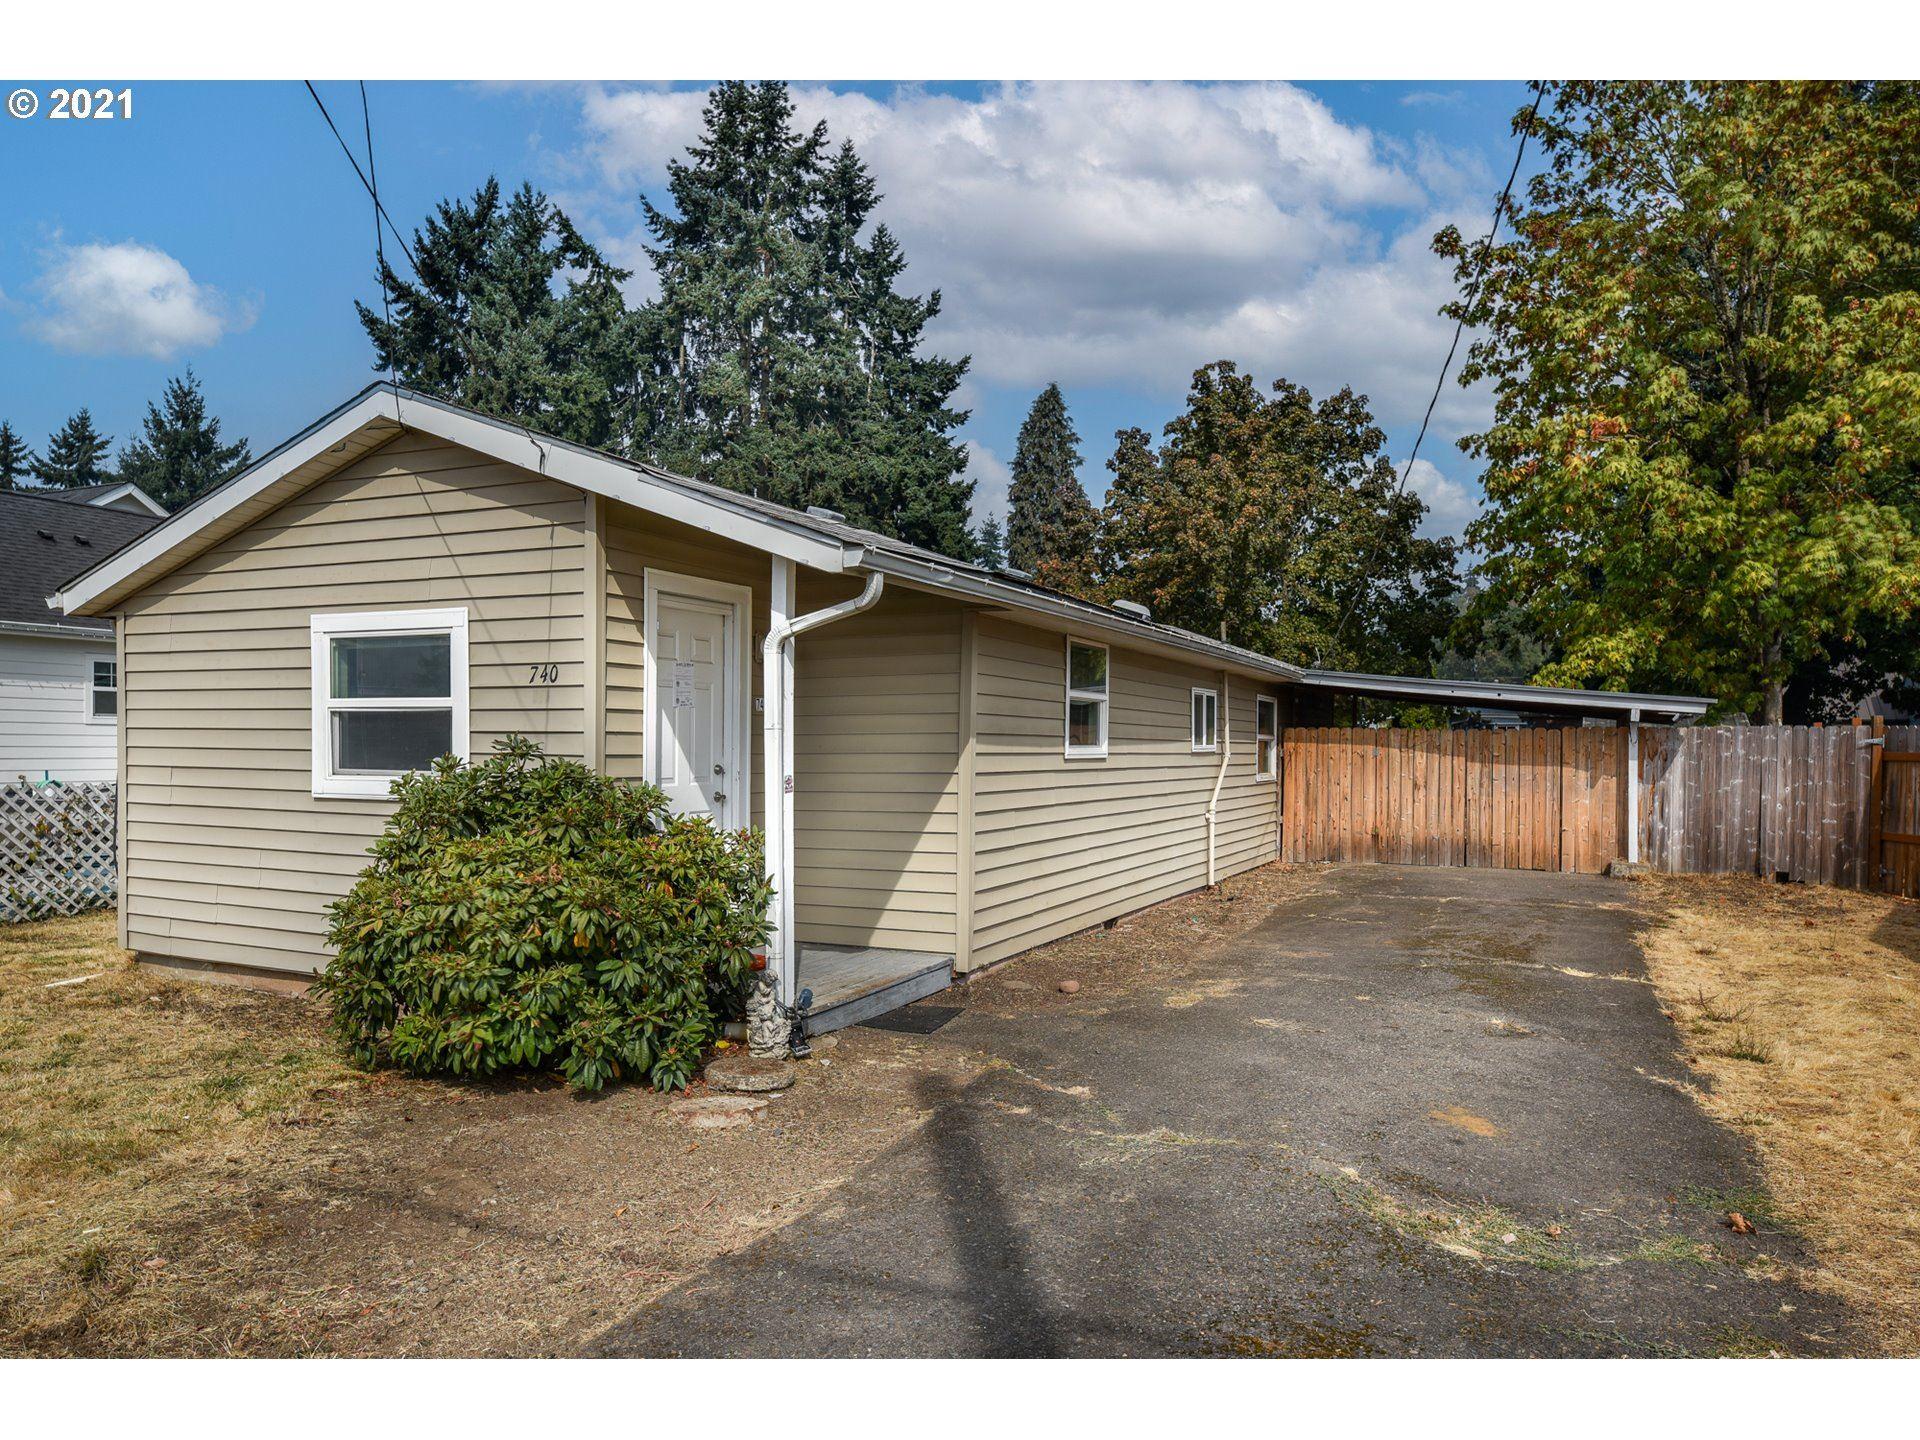 740 W M ST, Springfield, OR 97477 - MLS#: 21102953